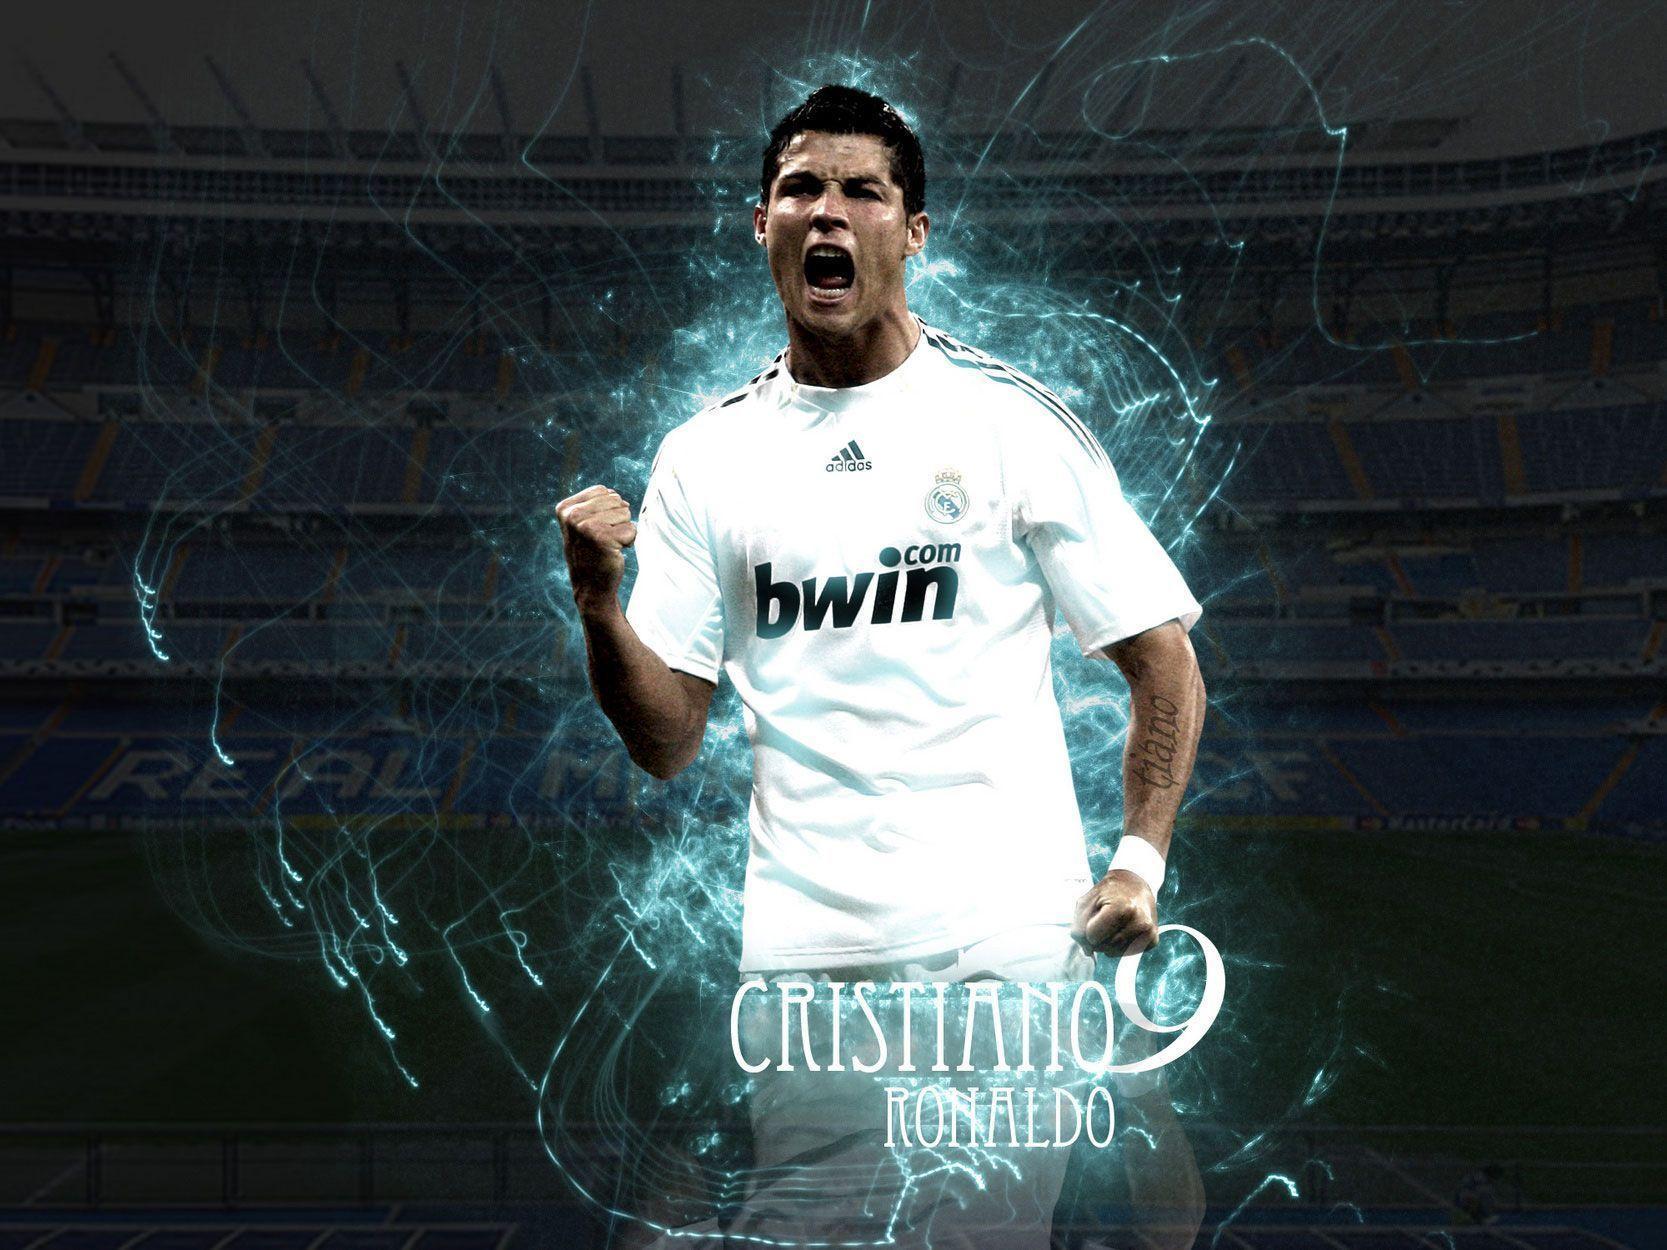 Cristiano Ronaldo WallpapersHd Wallpapers